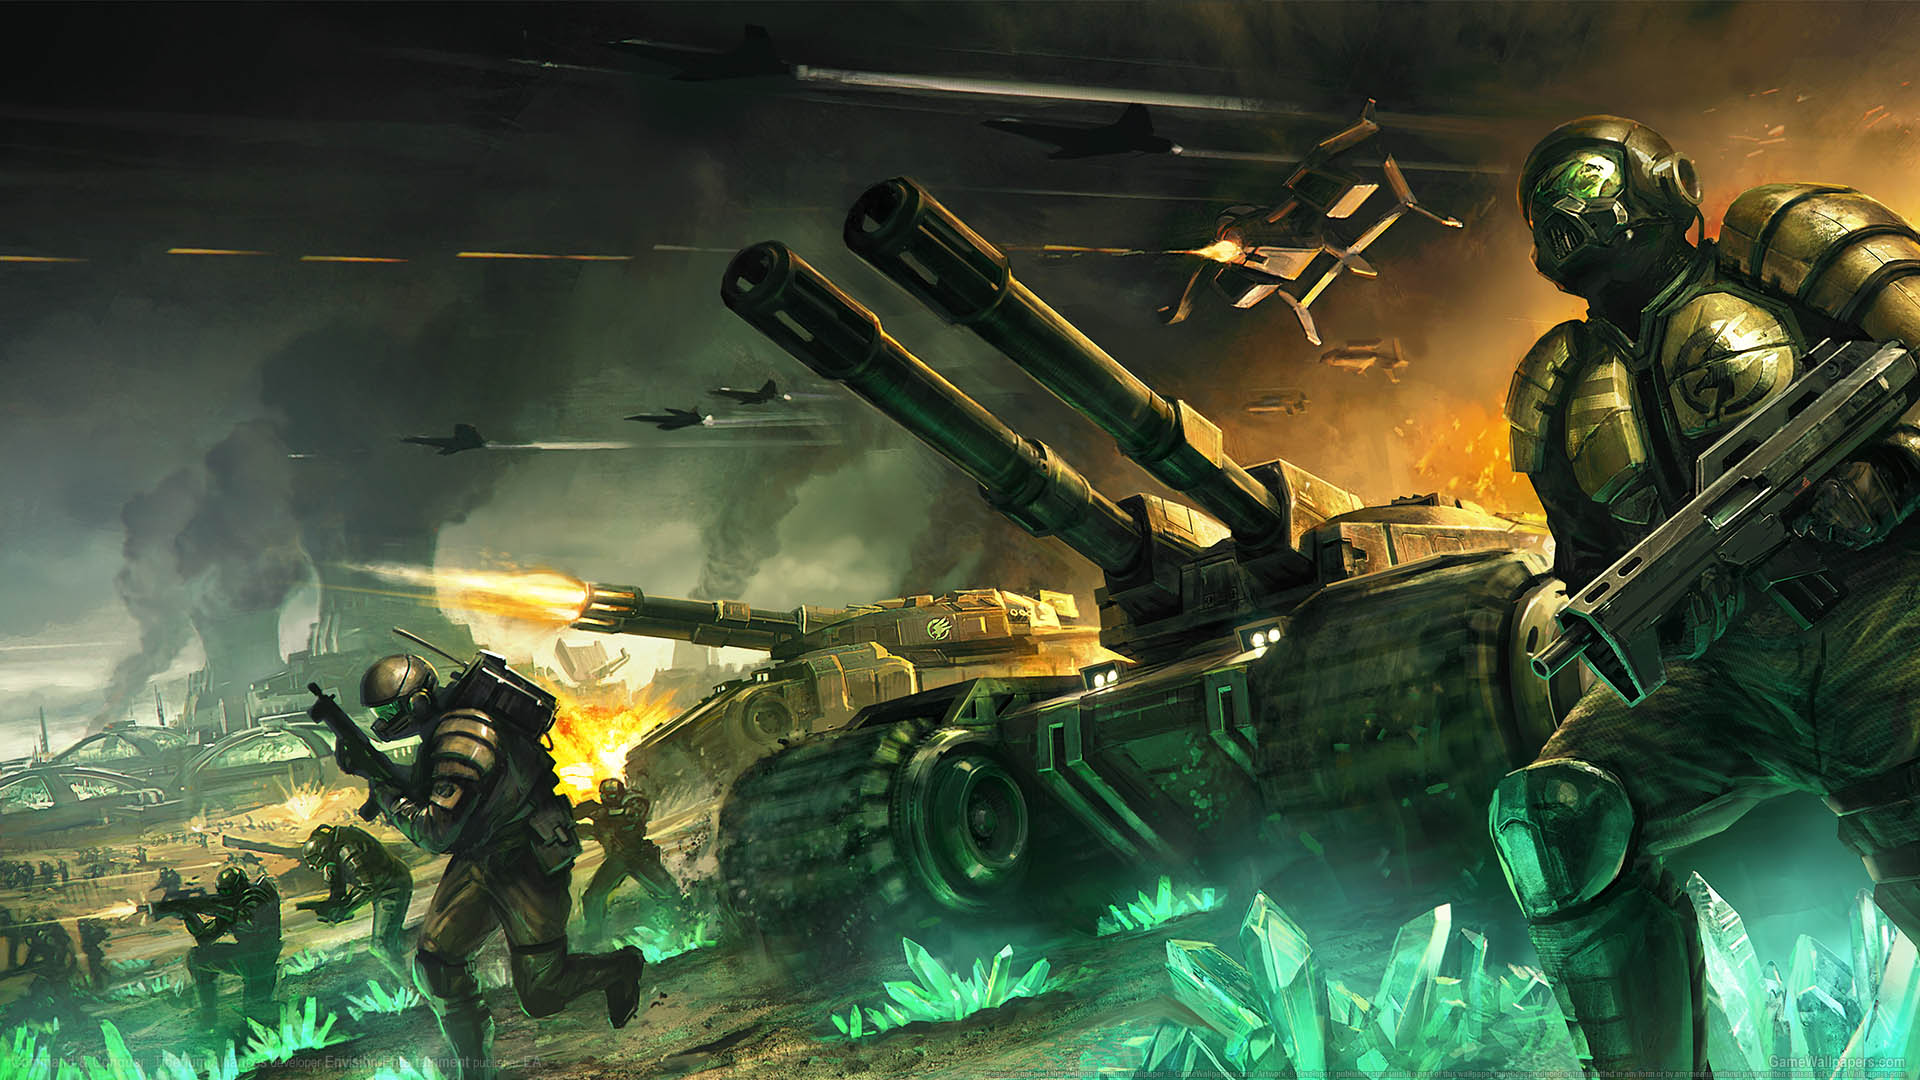 Command & Conquer: Tiberium Alliances fondo de escritorio 01 1920x1080